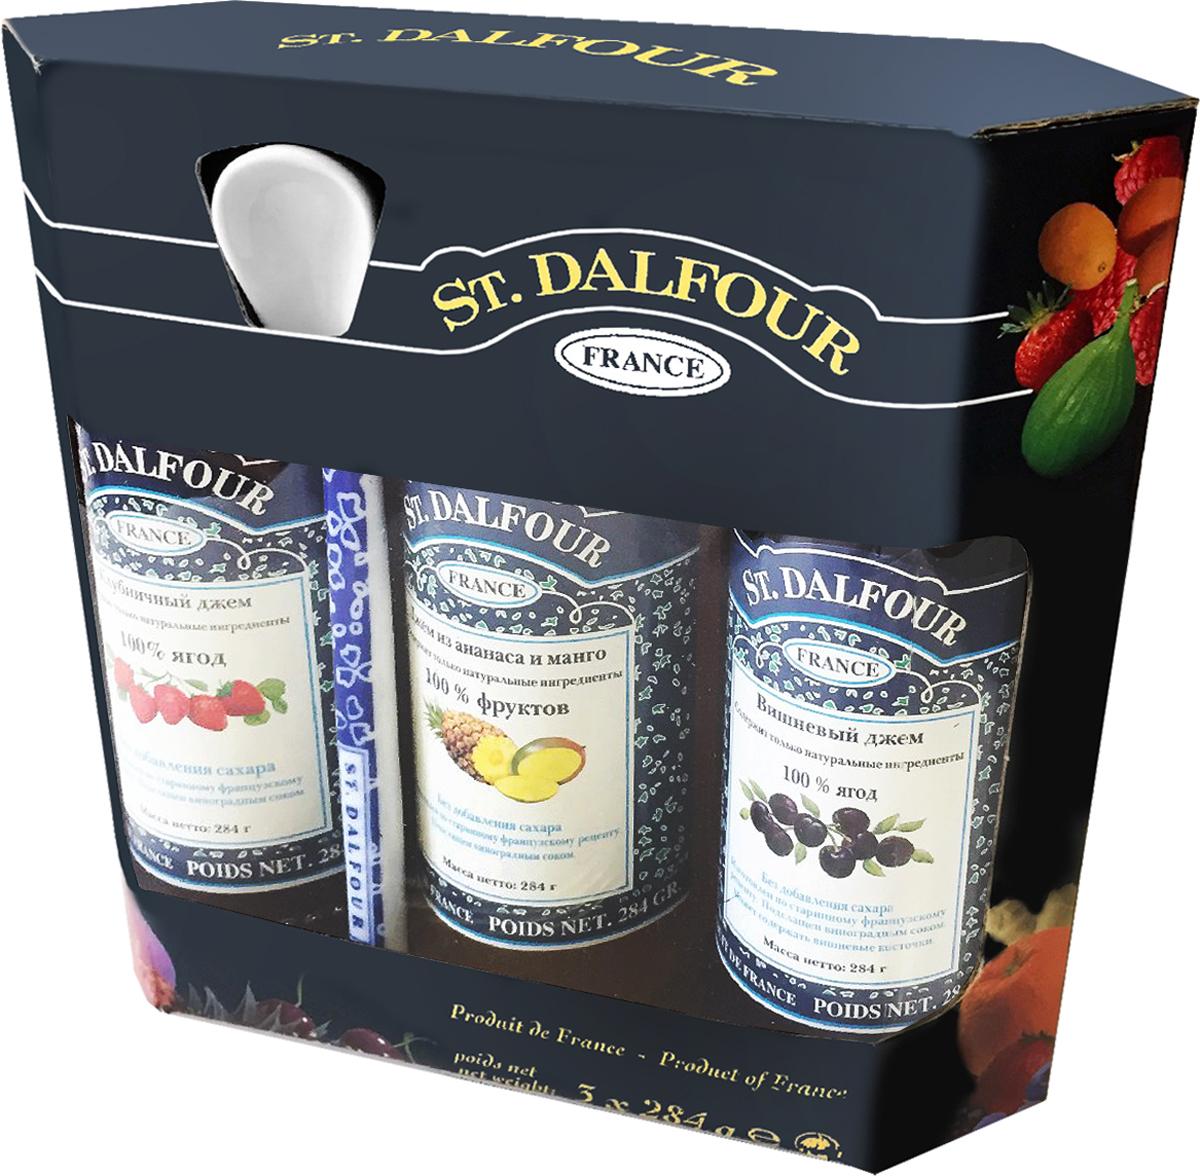 St. Dalfour подарочный набор 3 джема клубника, ананас и манго, вишня, 852 г st dalfour джем кумкват 284 г